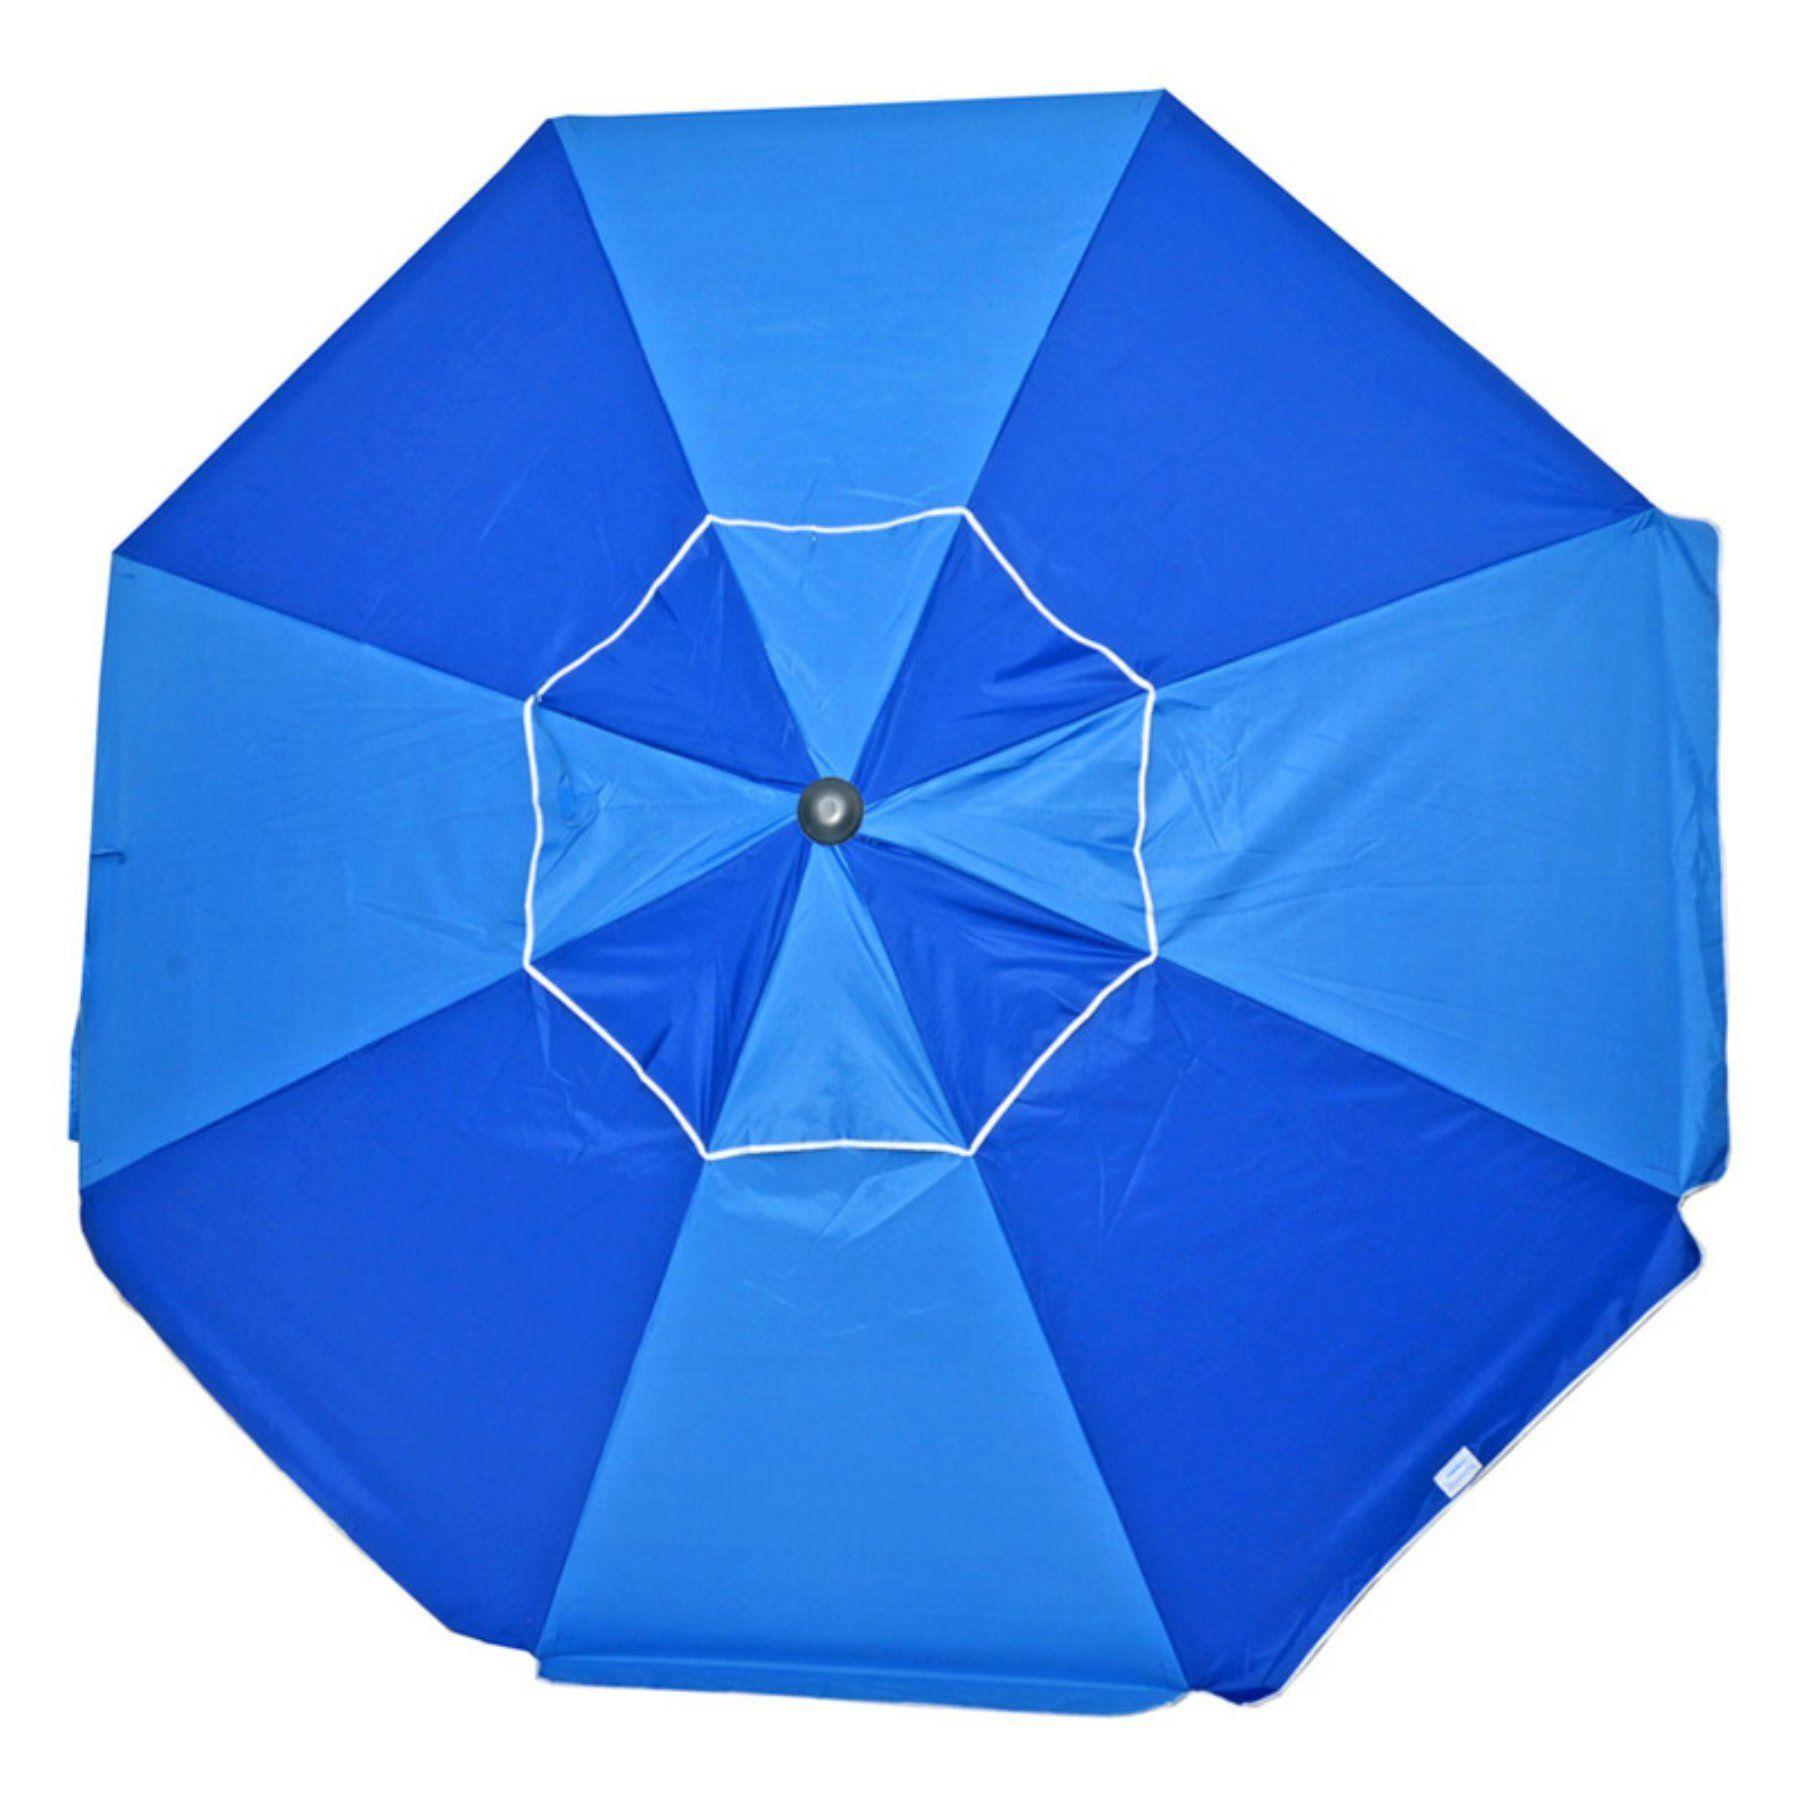 Shadezilla 9 ft Blue Pinwheel Fiberglass Market Patio Umbrella